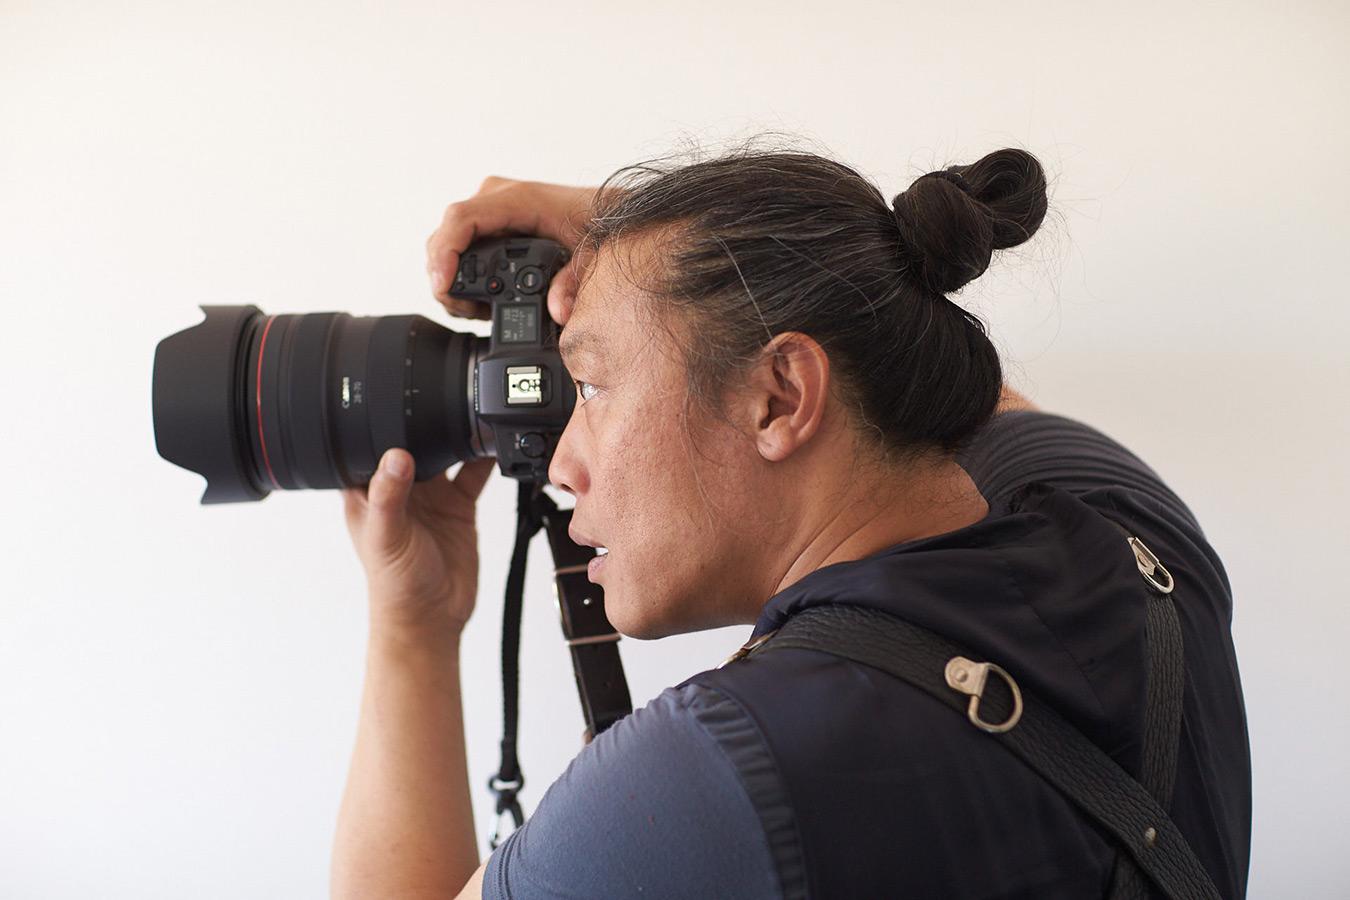 Wedding photographer Franky Tsang